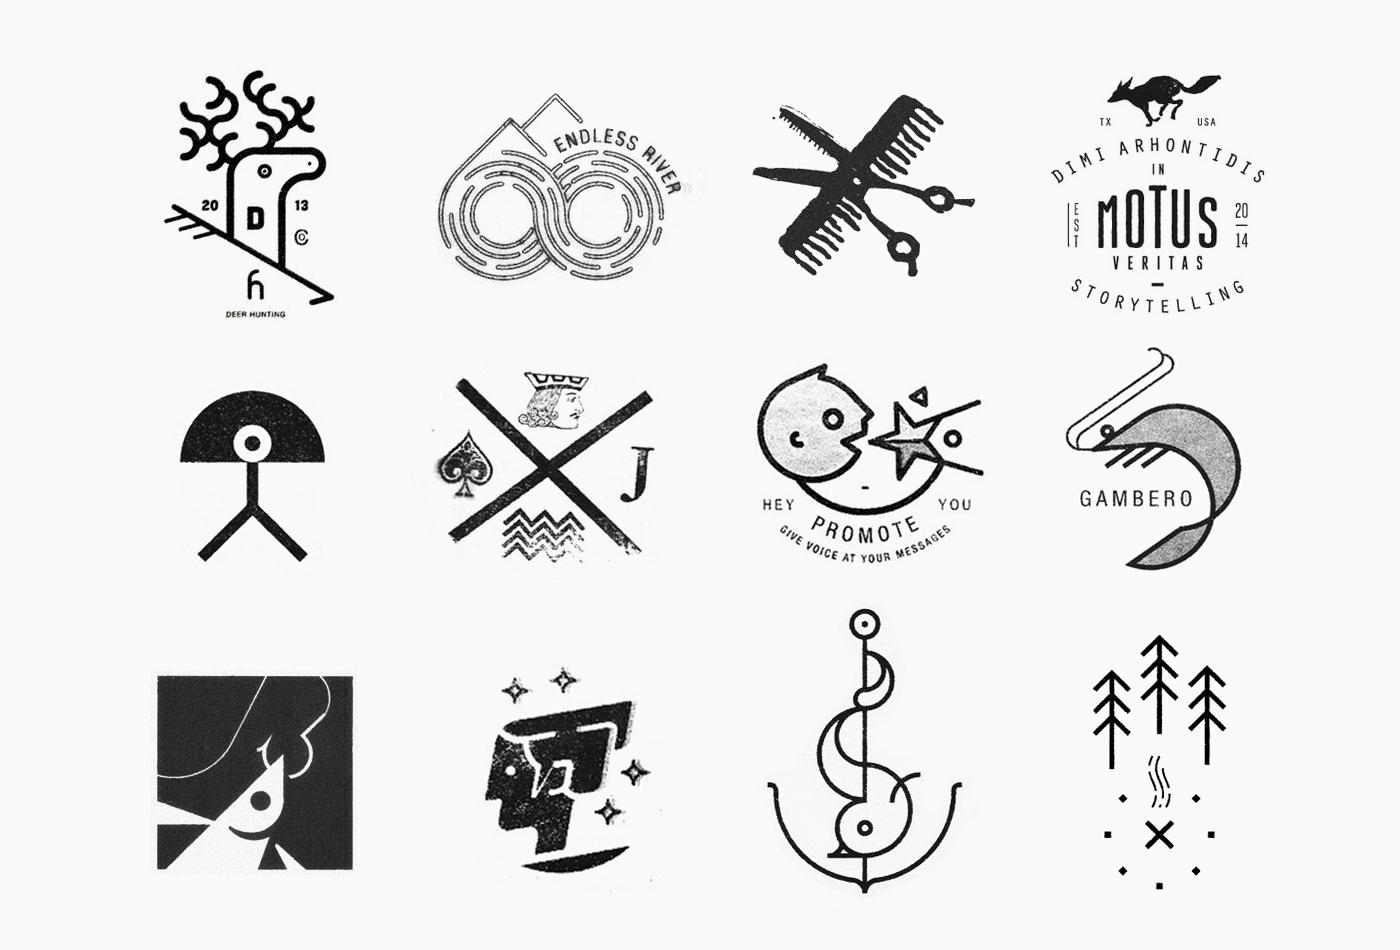 00-logo-collection-vacaliebres-copia1